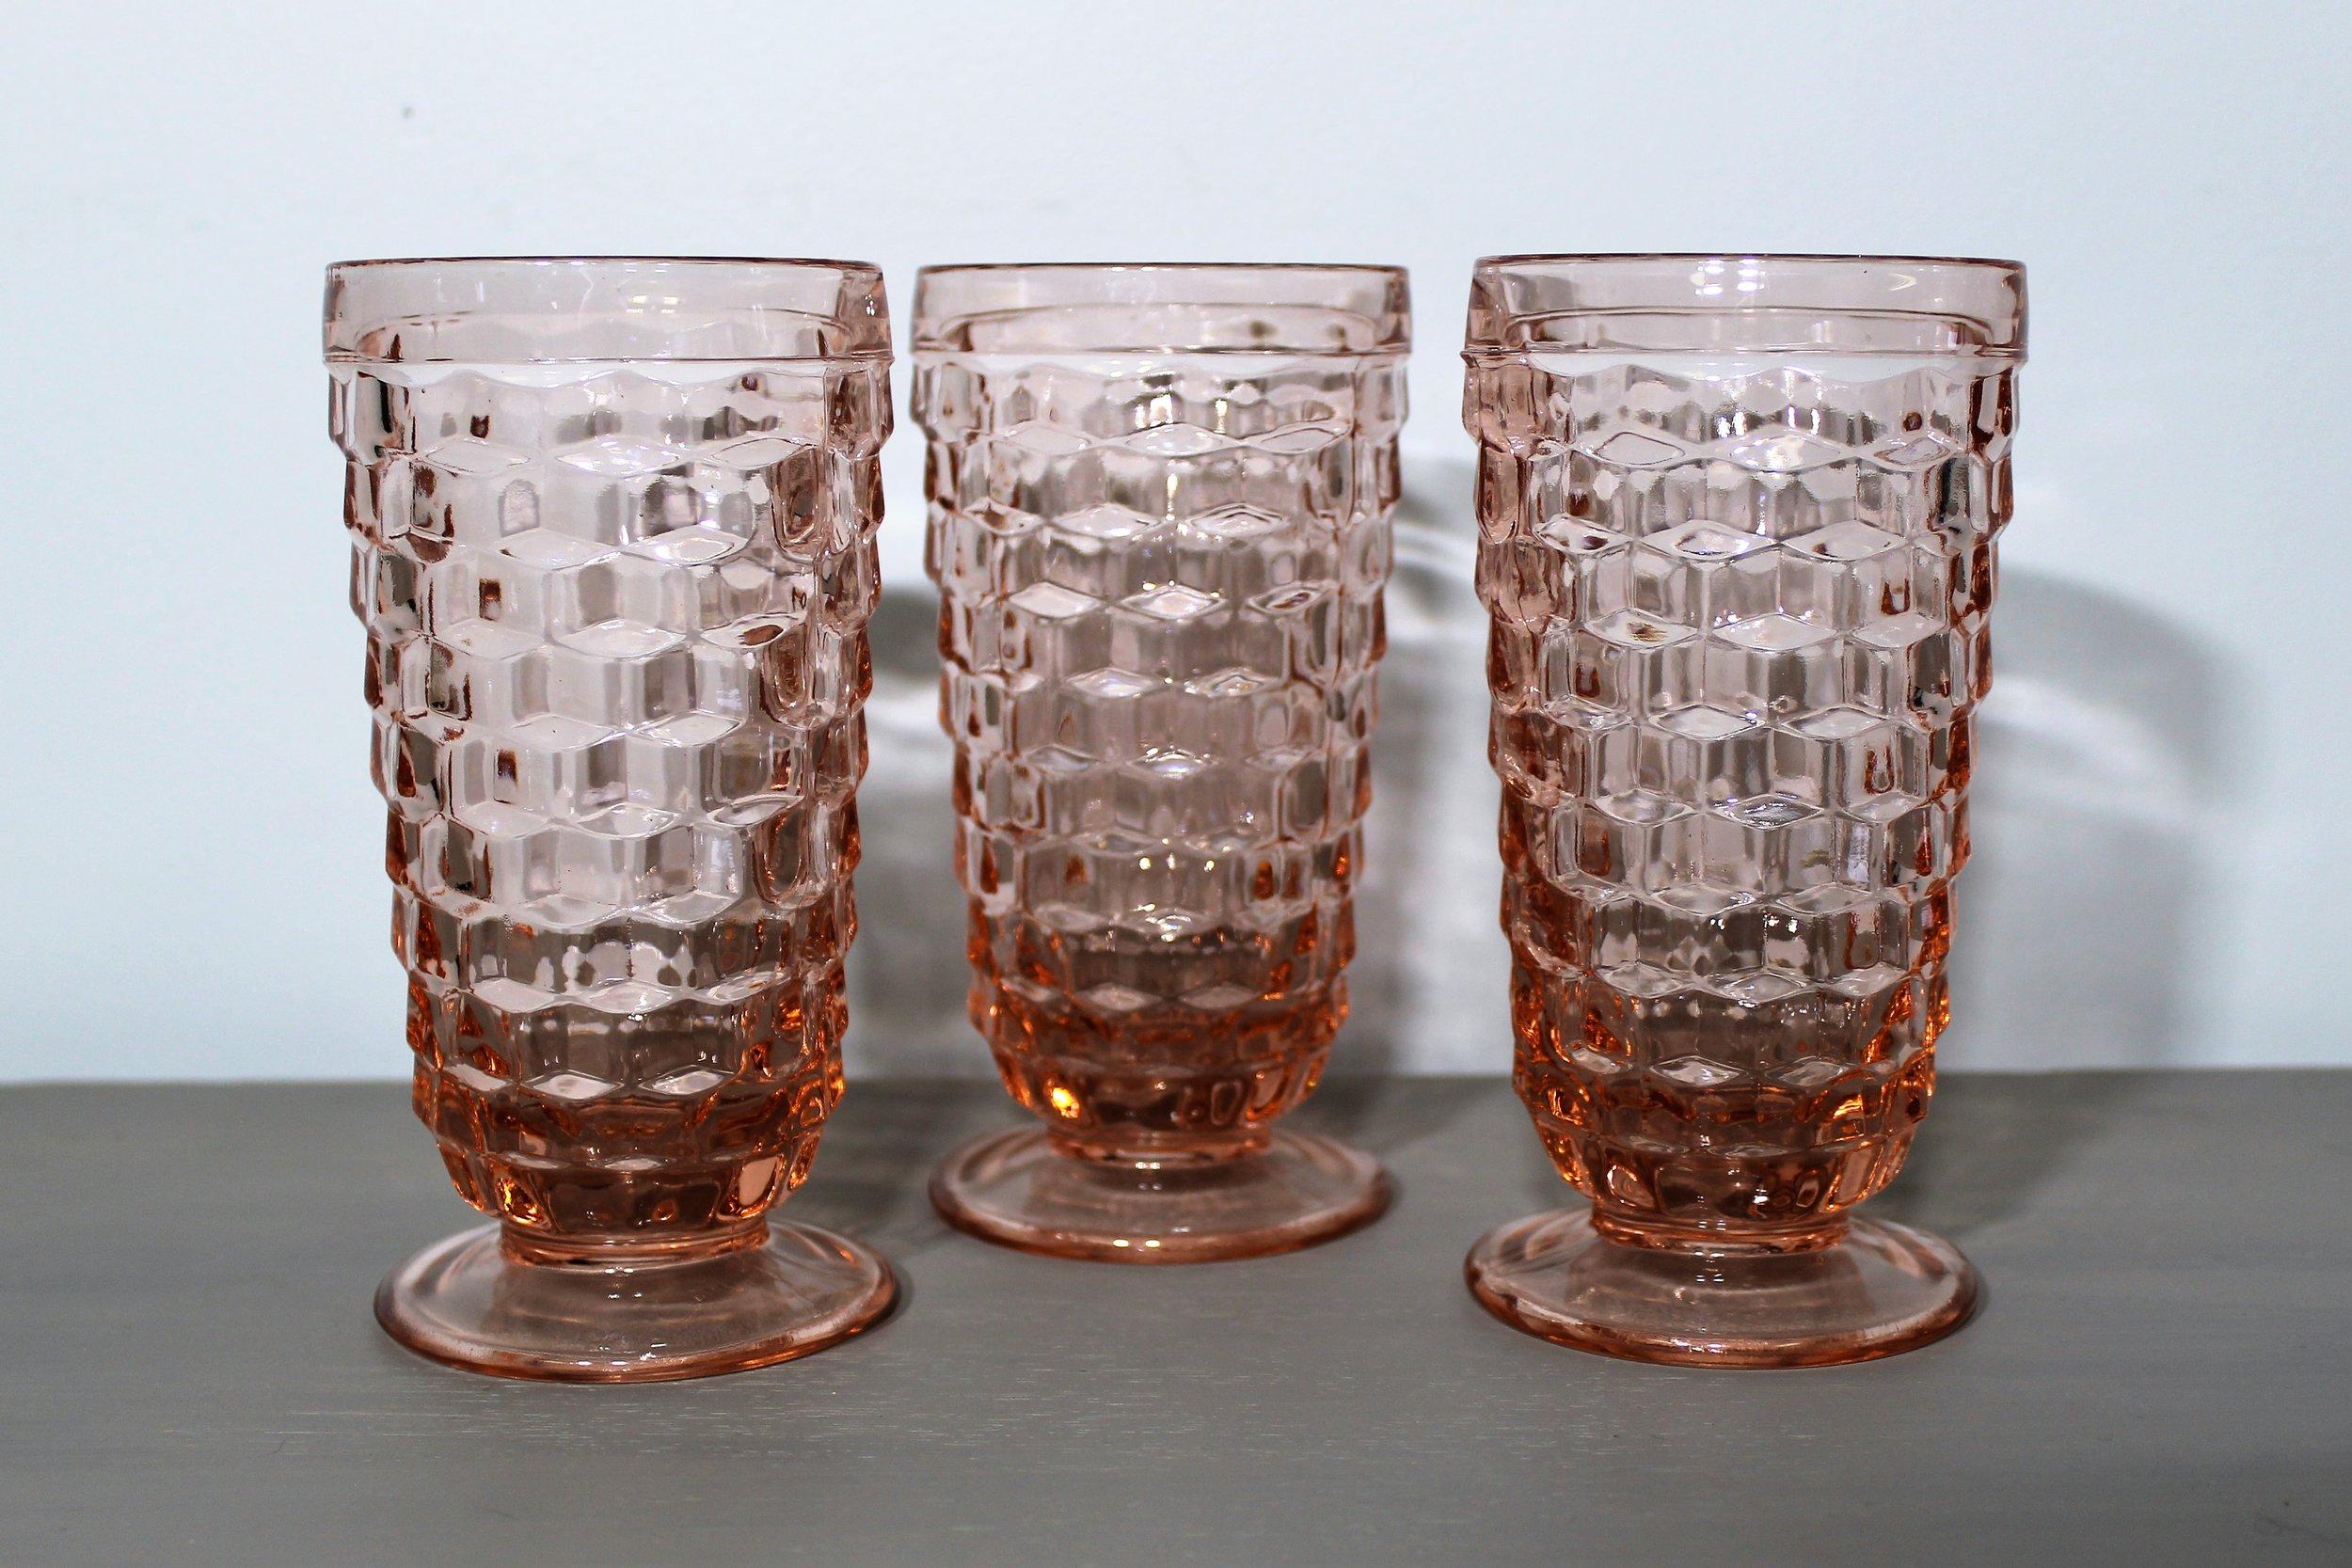 Pink Goblets - Description ~ lovely set of light pink glasswareQuantity ~ 20Price ~ $2